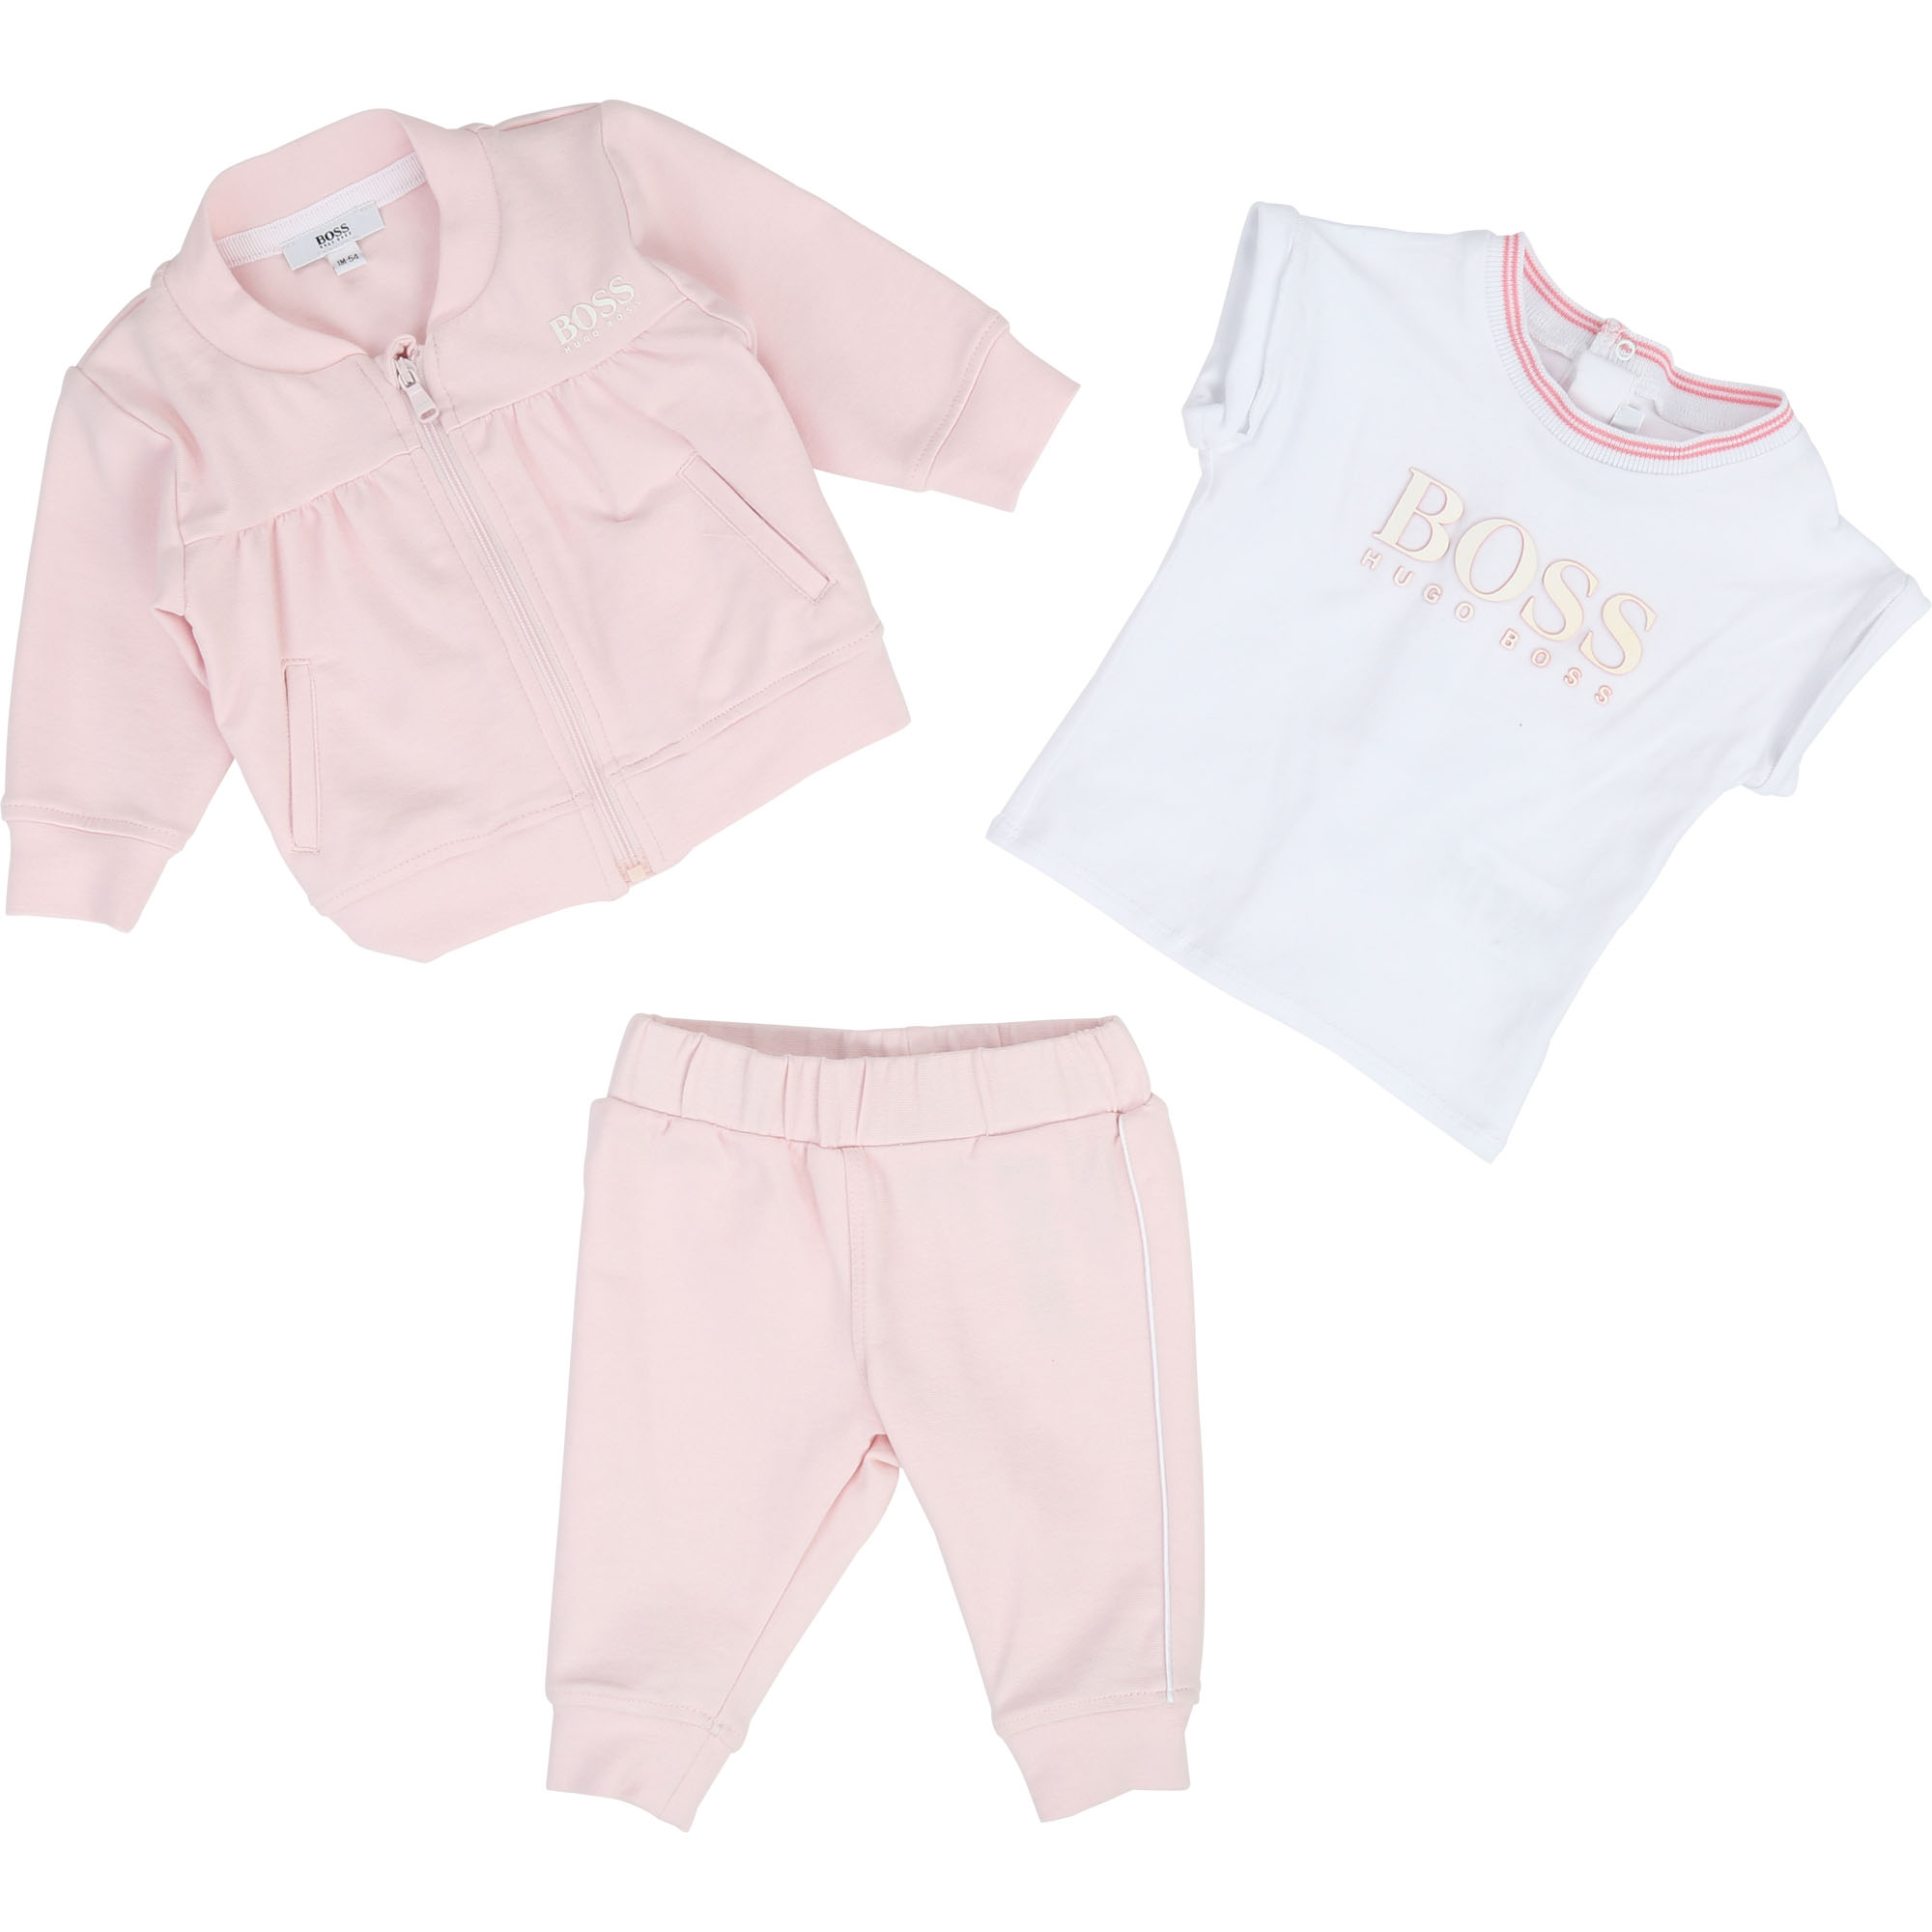 97ee8d62347d02 Boss Baby Set aus Jogginganzug und Shirt - rosa